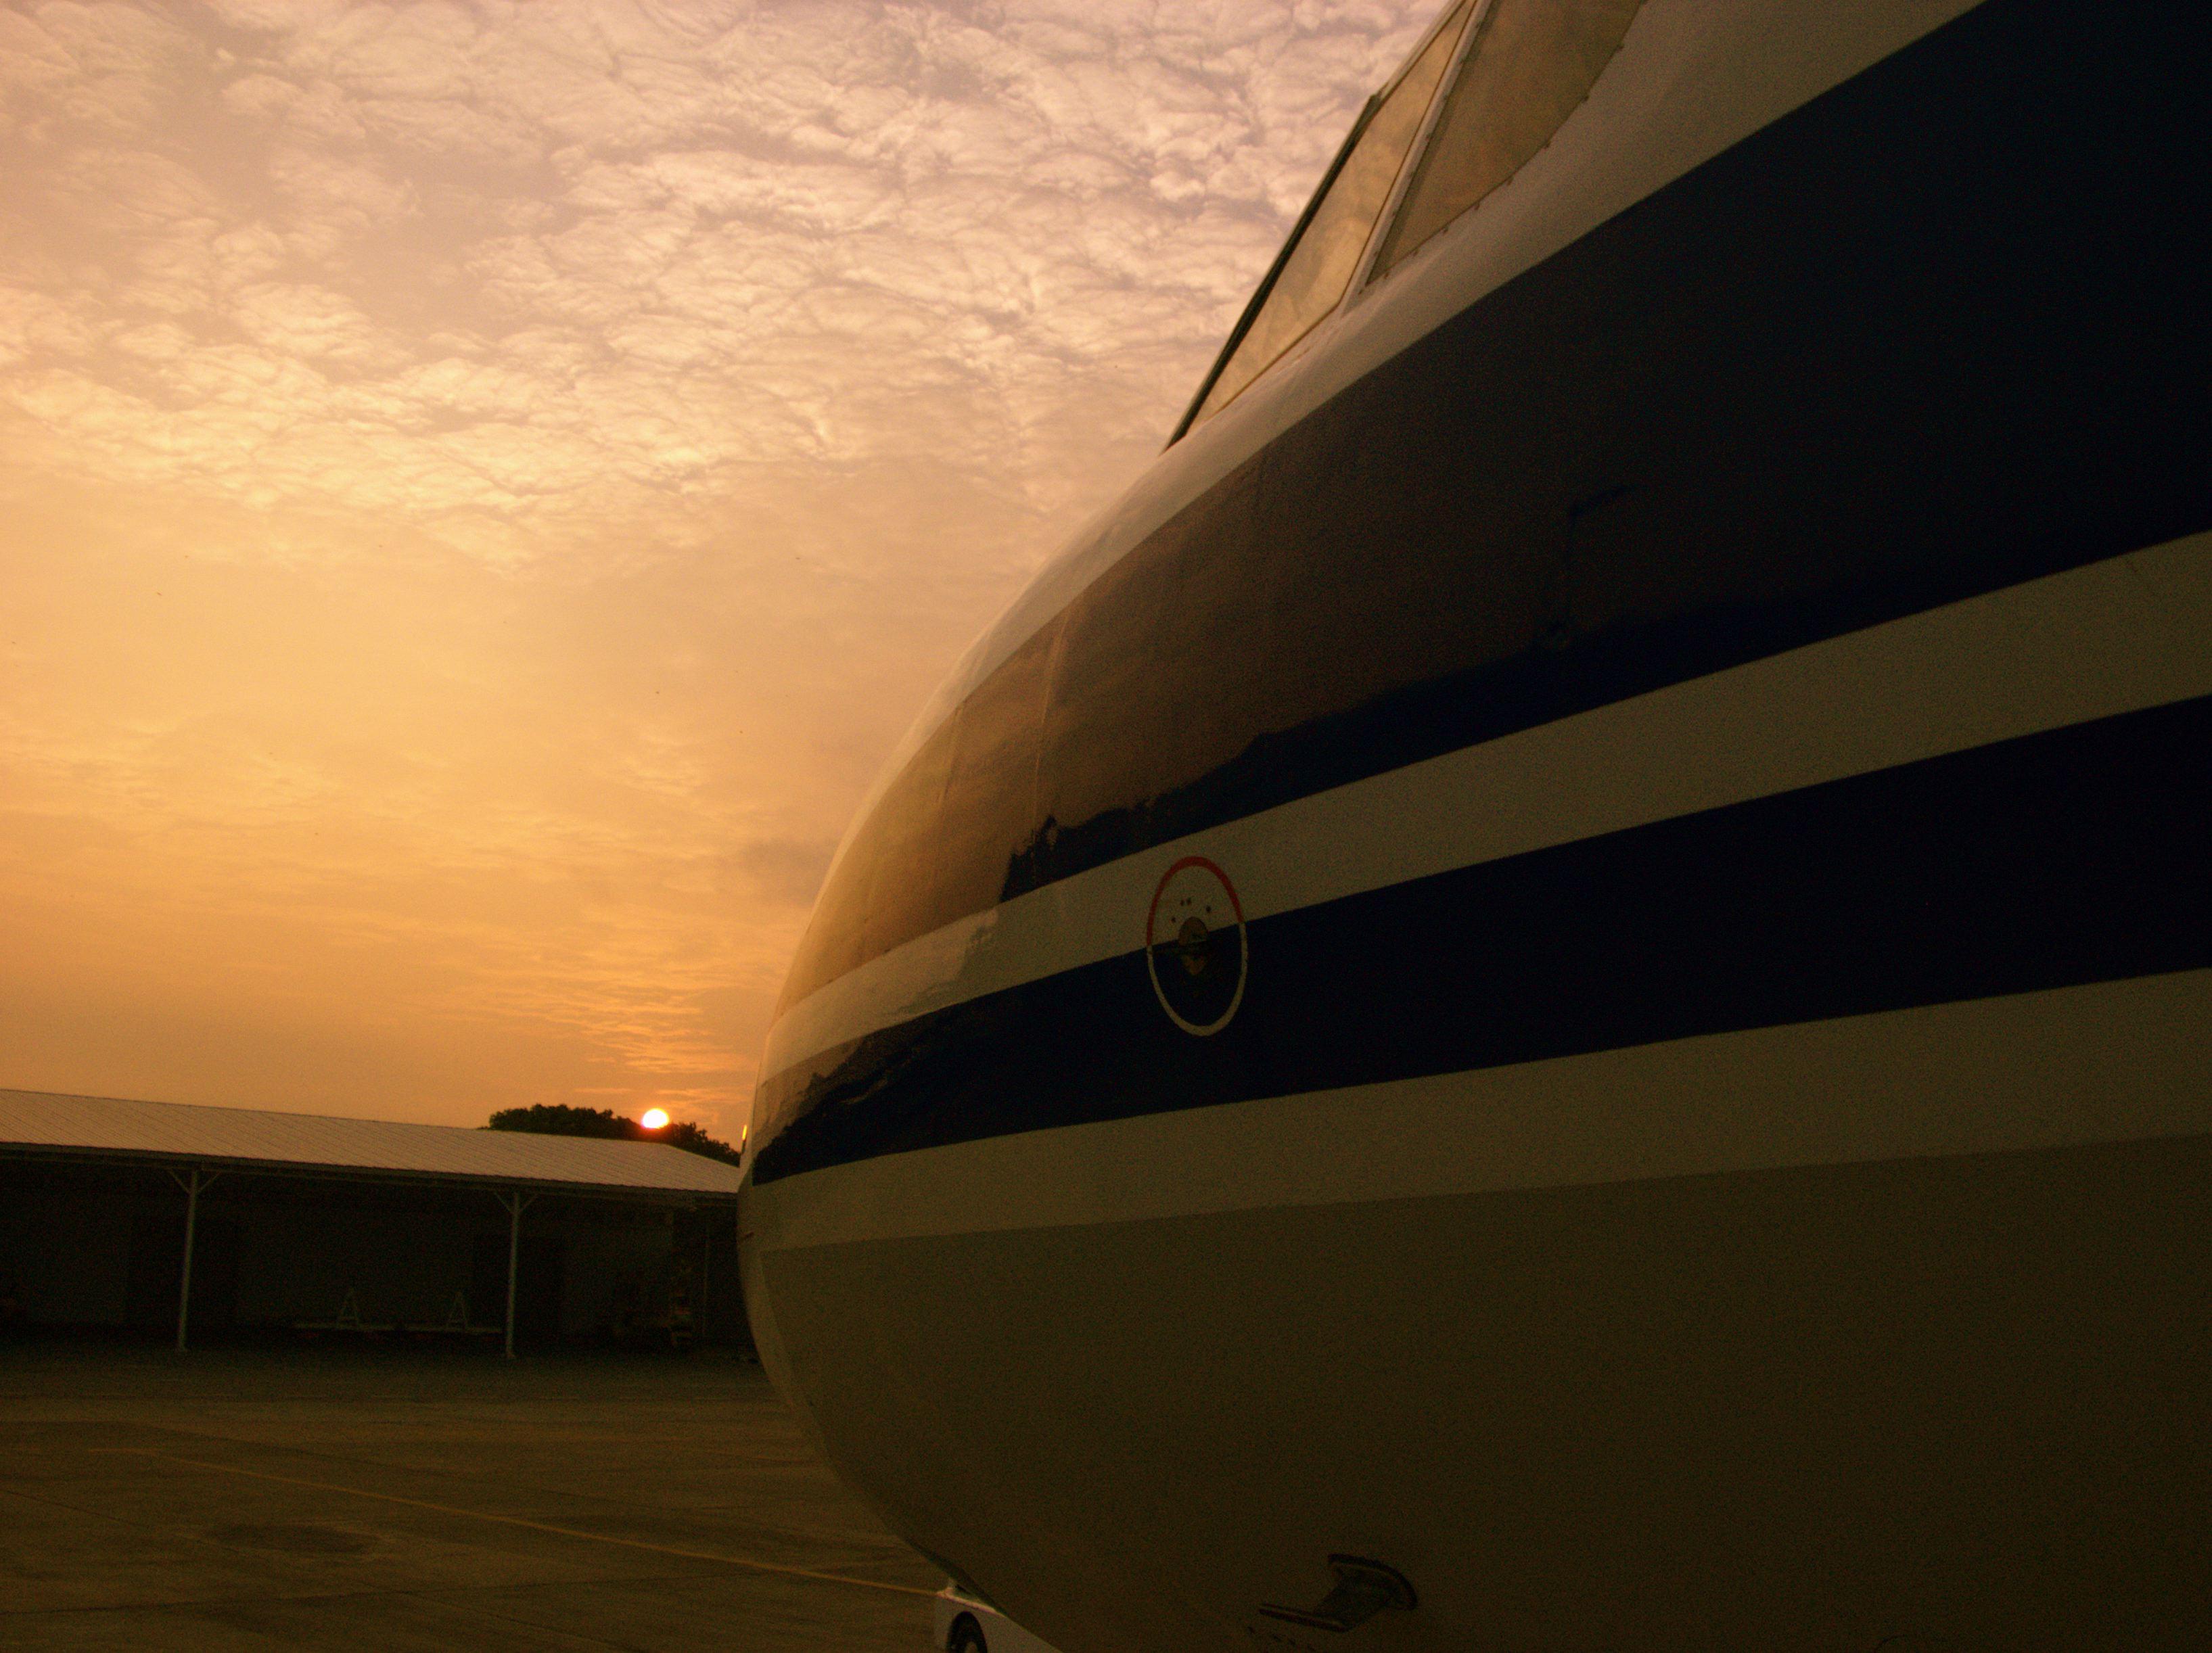 book cheap airfares, image by Jade Jackson